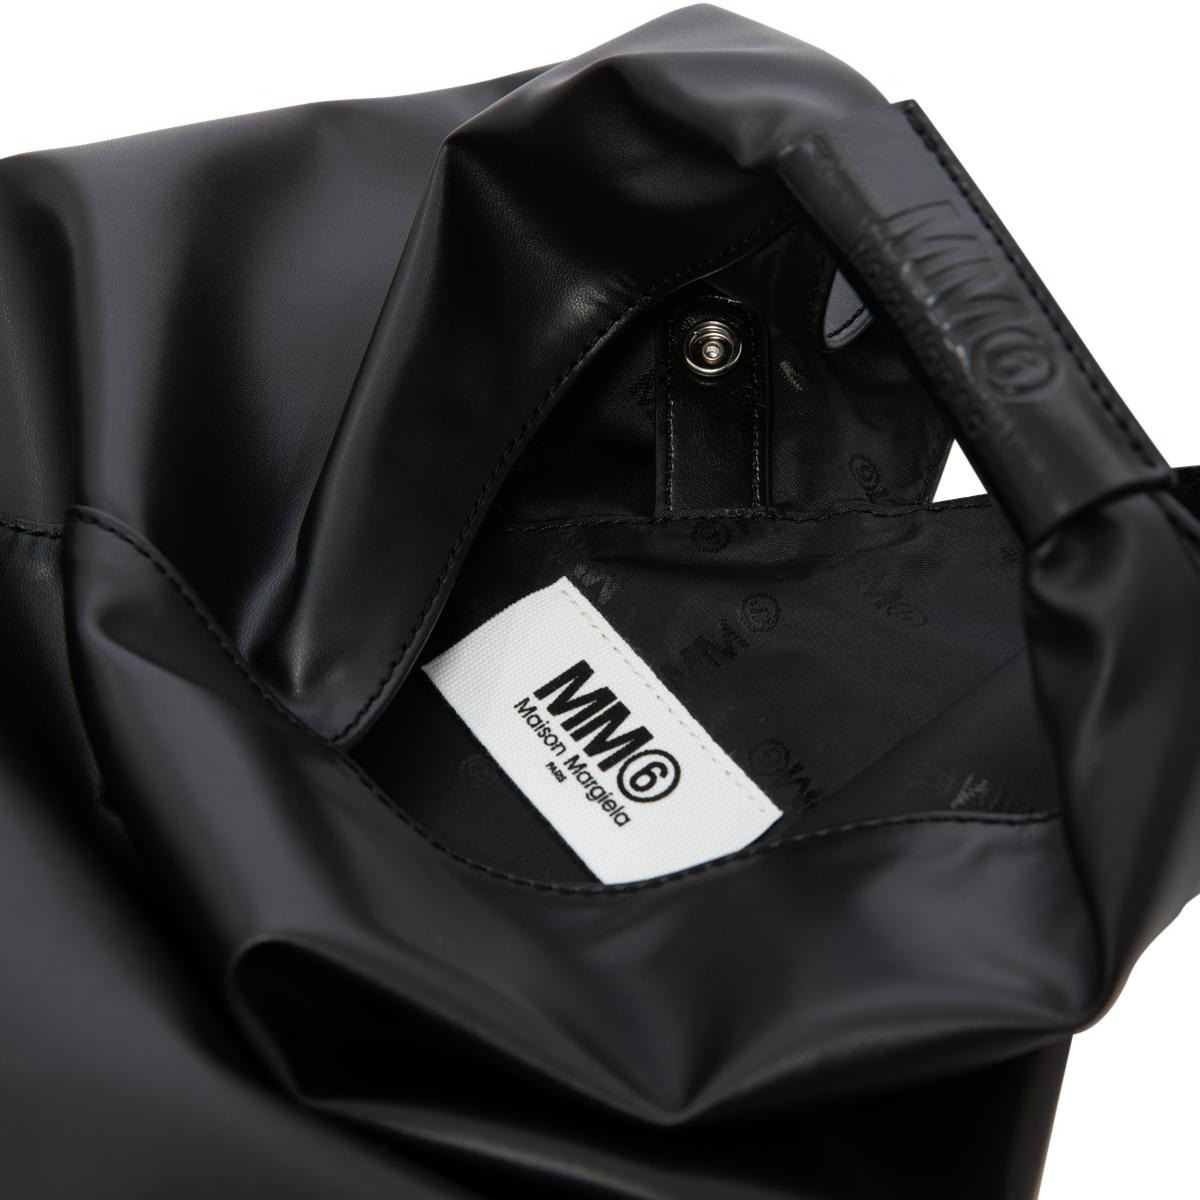 MM6 Maison Margiela Japanese Bag (Small)